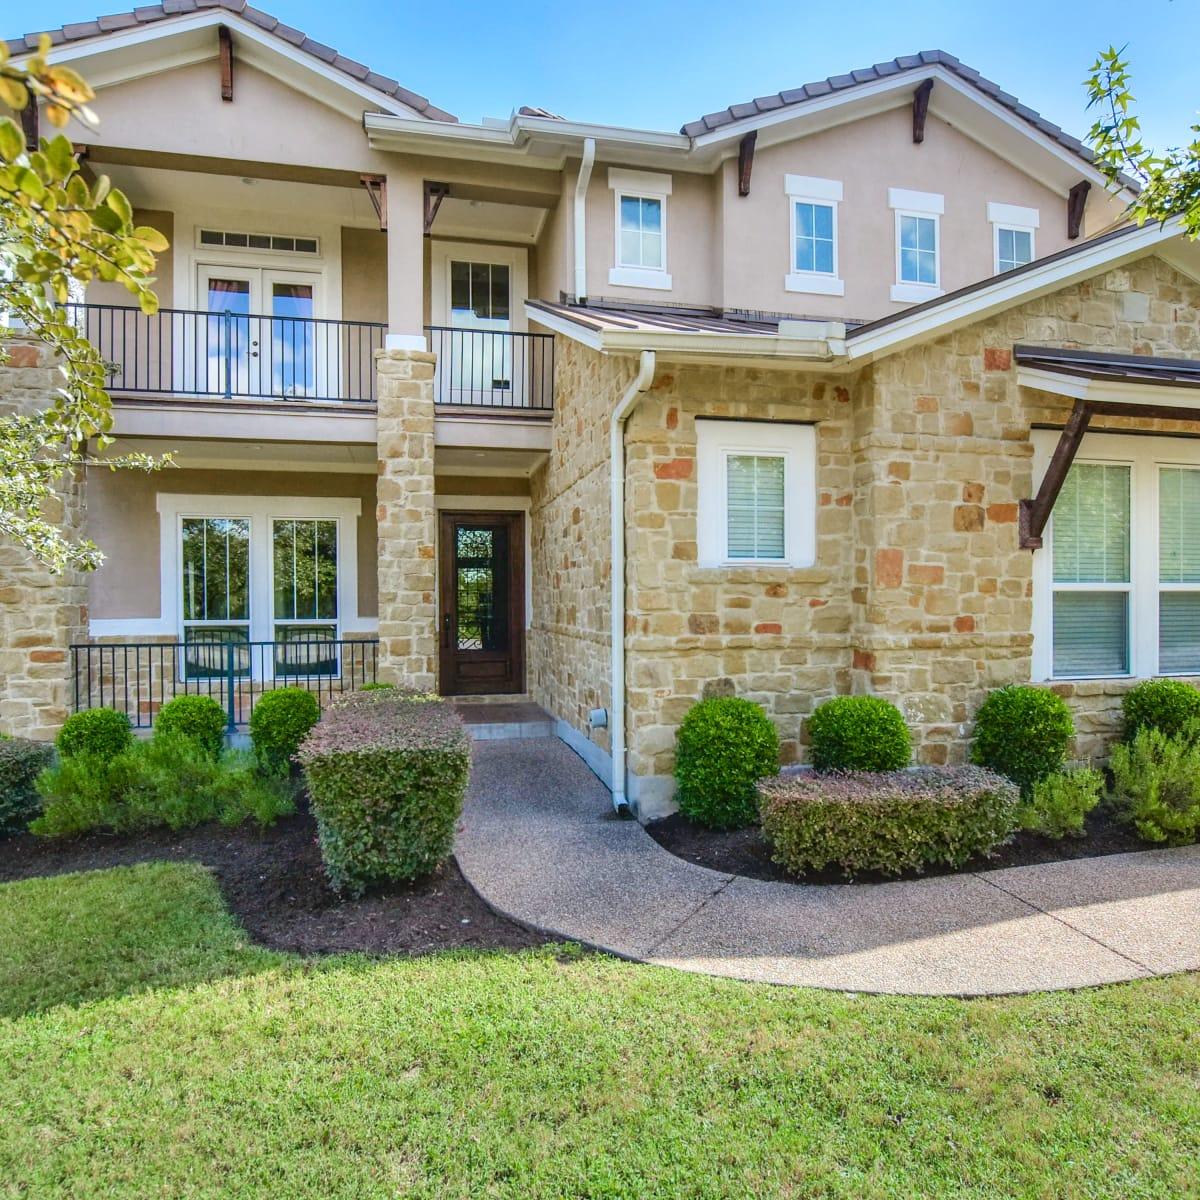 Austin house_2405 Swirling Wind